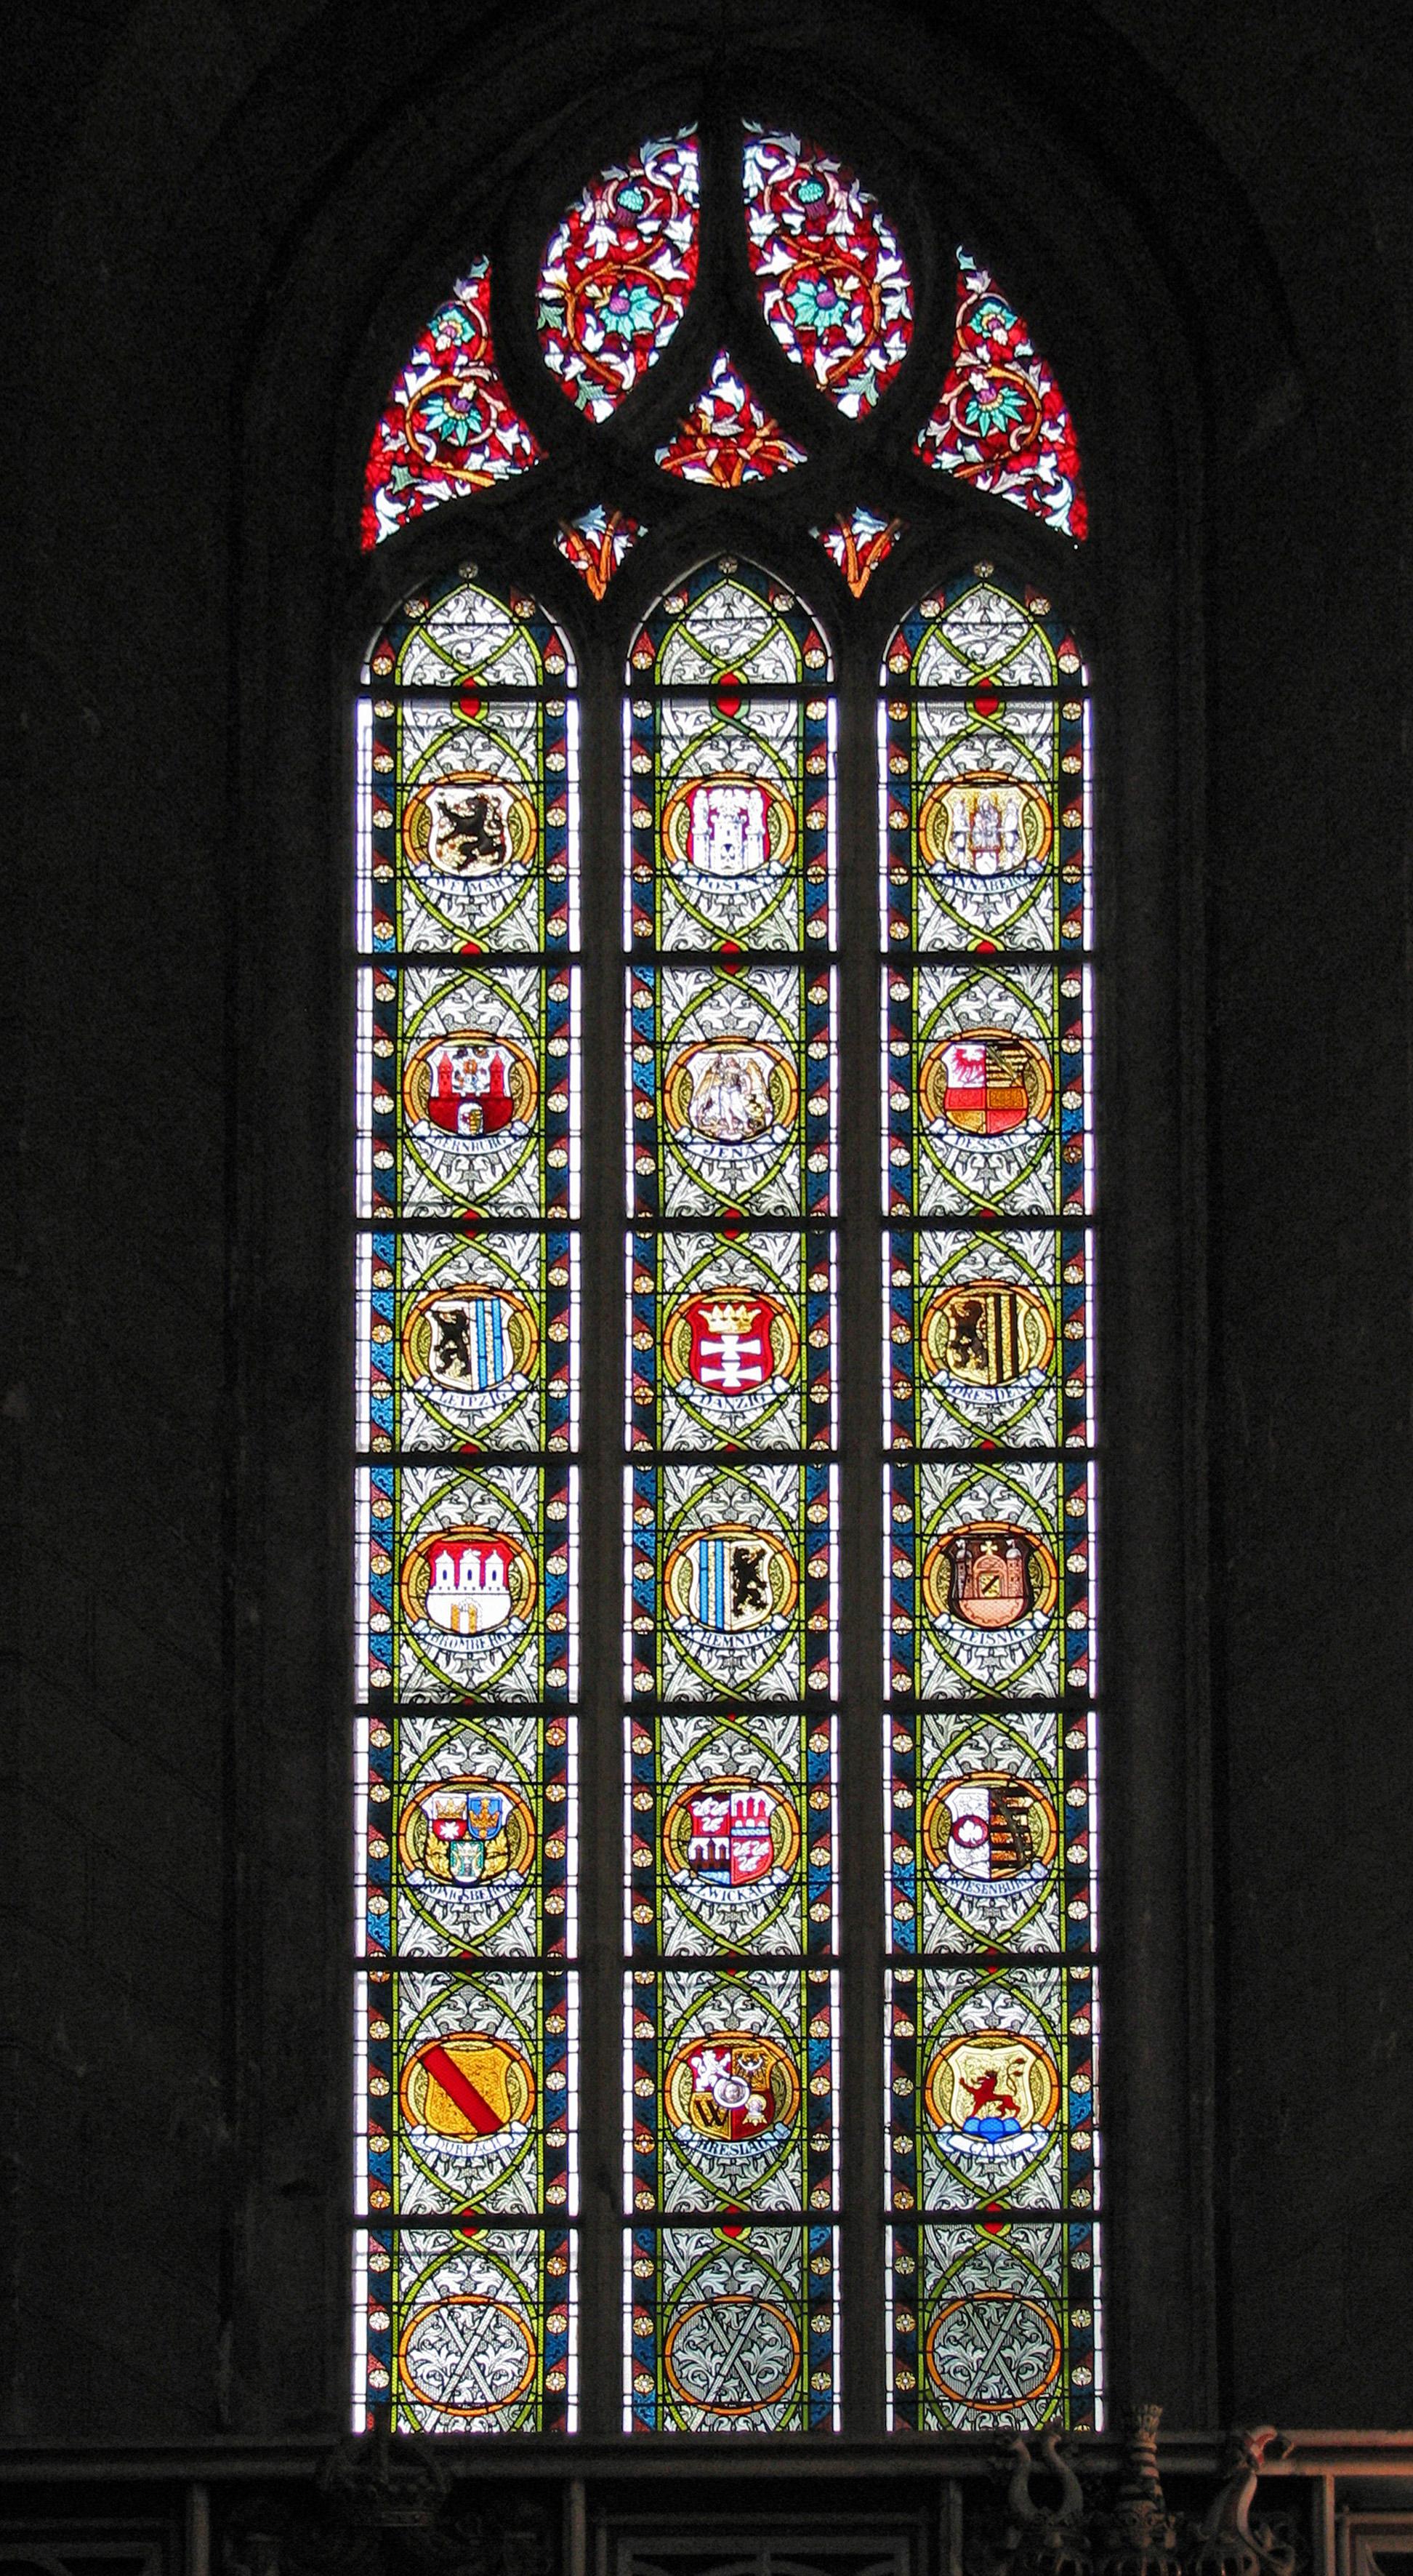 File:Wittenberg Schlosskirche Fenster Staedte.JPG